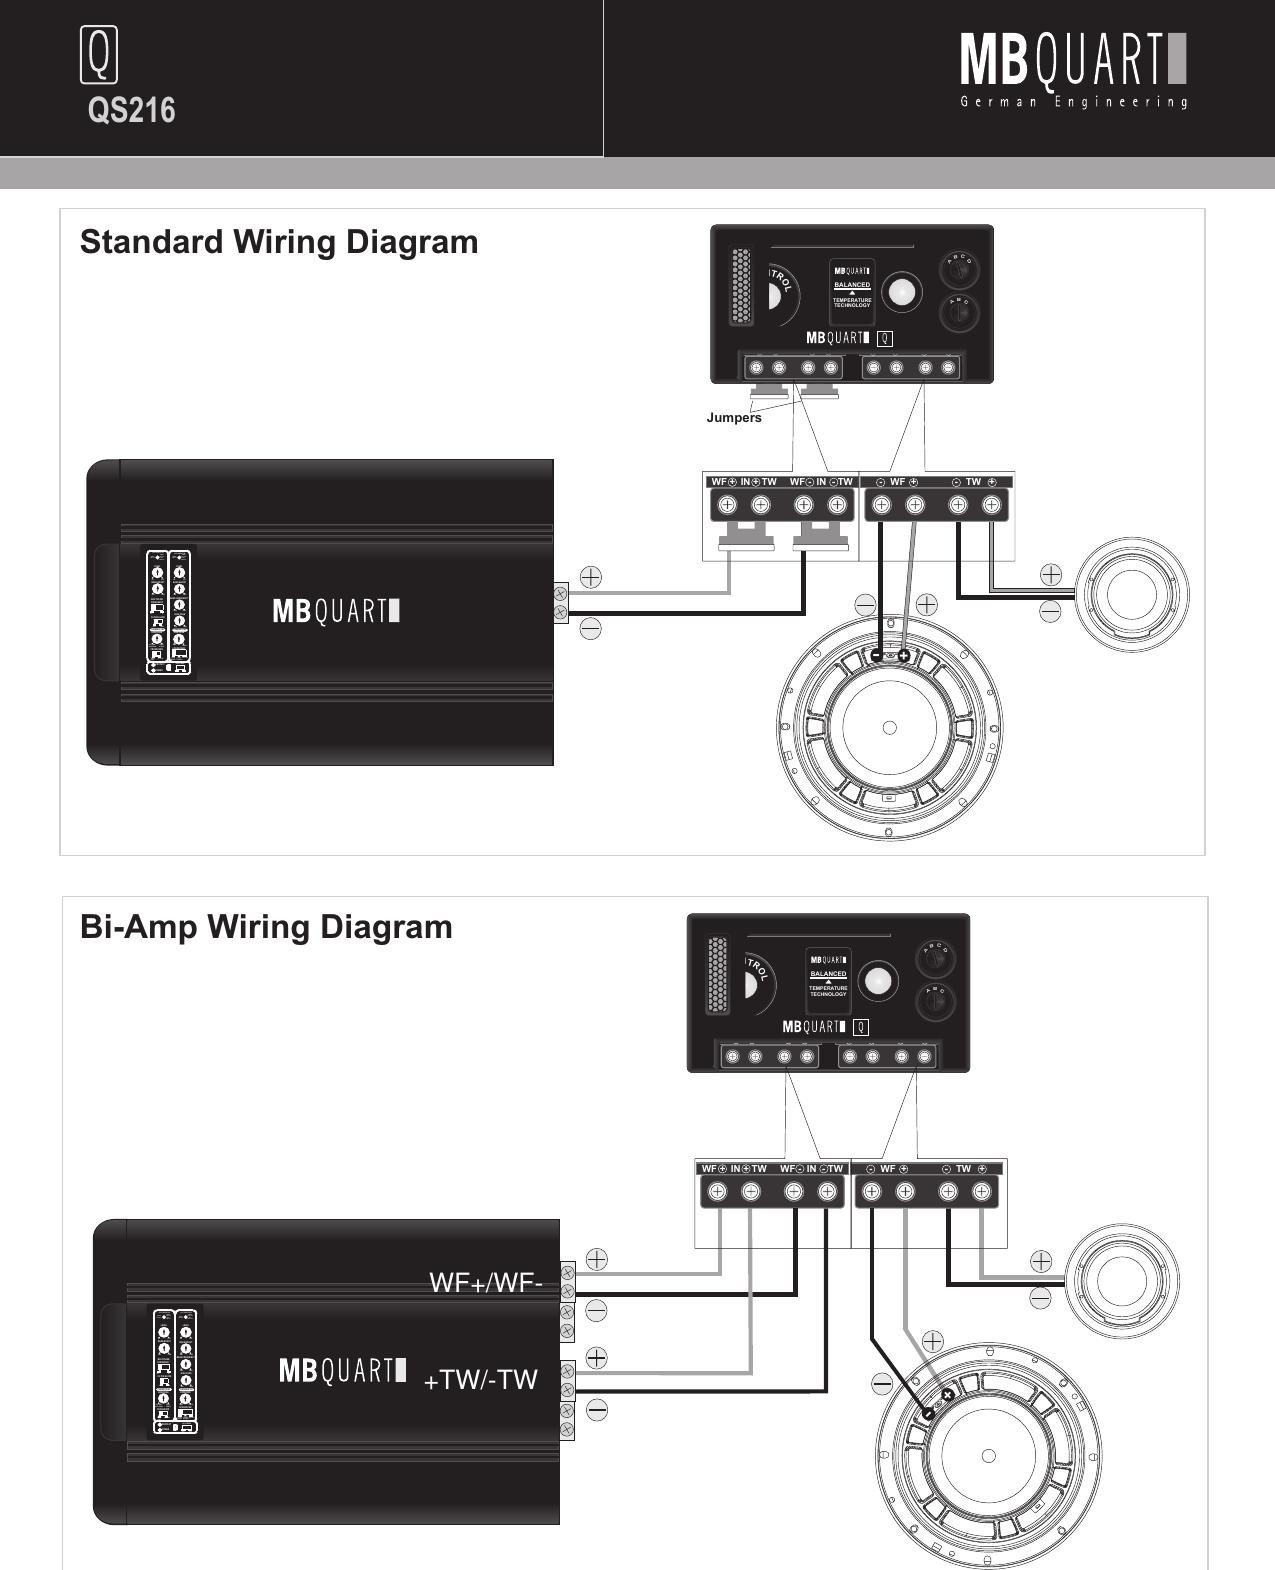 Mb Quart Wire Diagram - Free Car Wiring Diagrams •